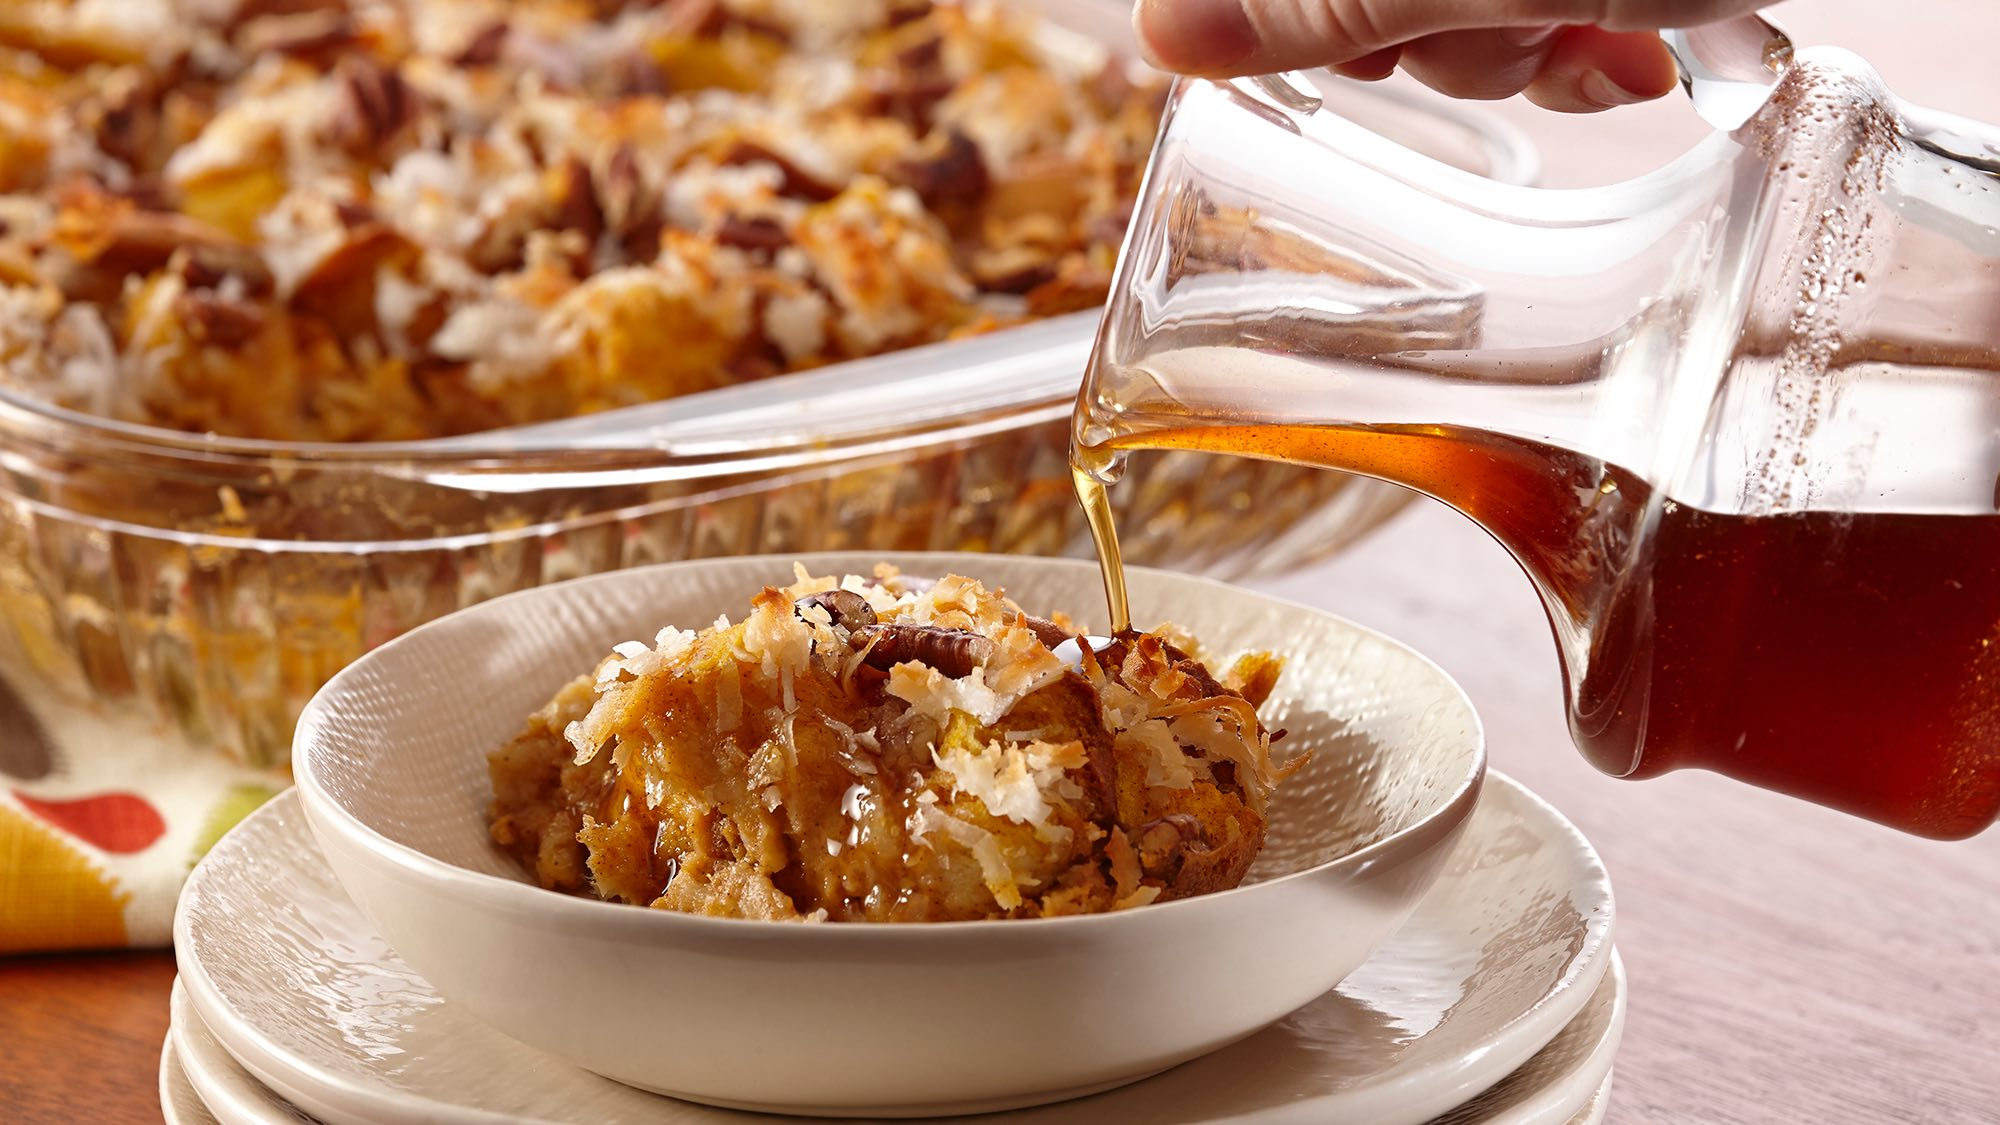 gluten-free-coconut-pumpkin-bread-pudding.jpg